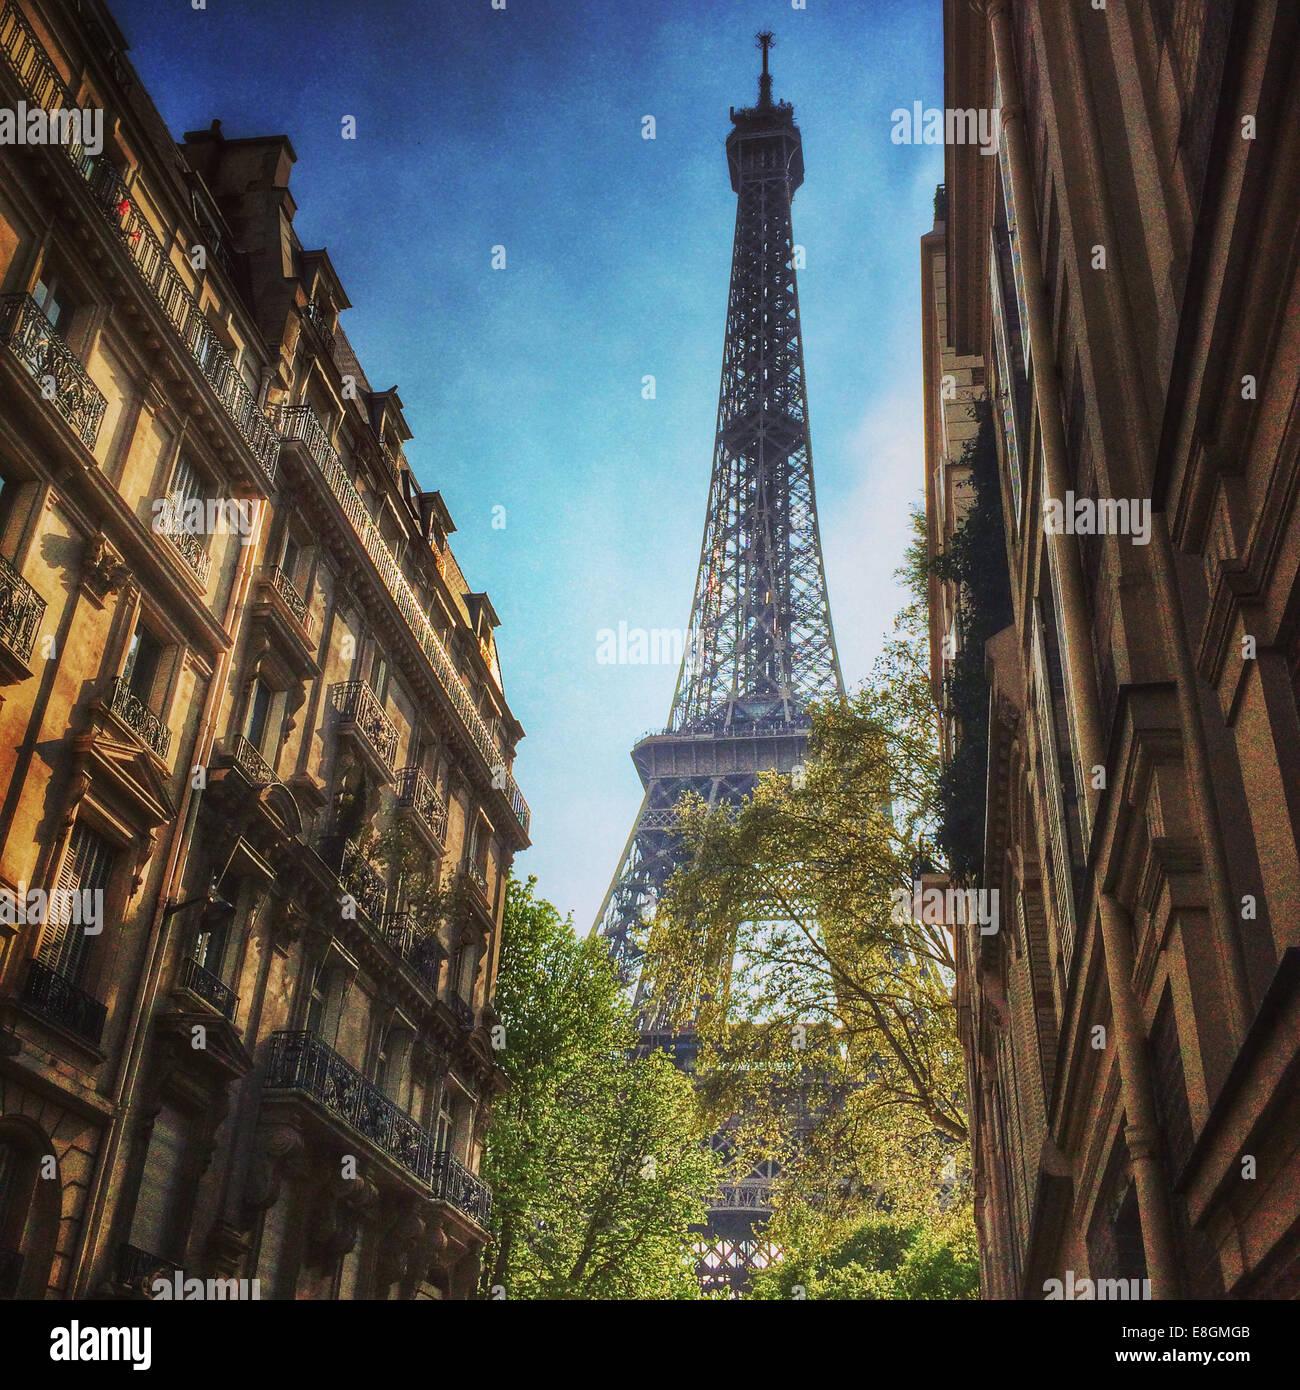 France, Paris, Eiffel Tower seen in between townhouses - Stock Image